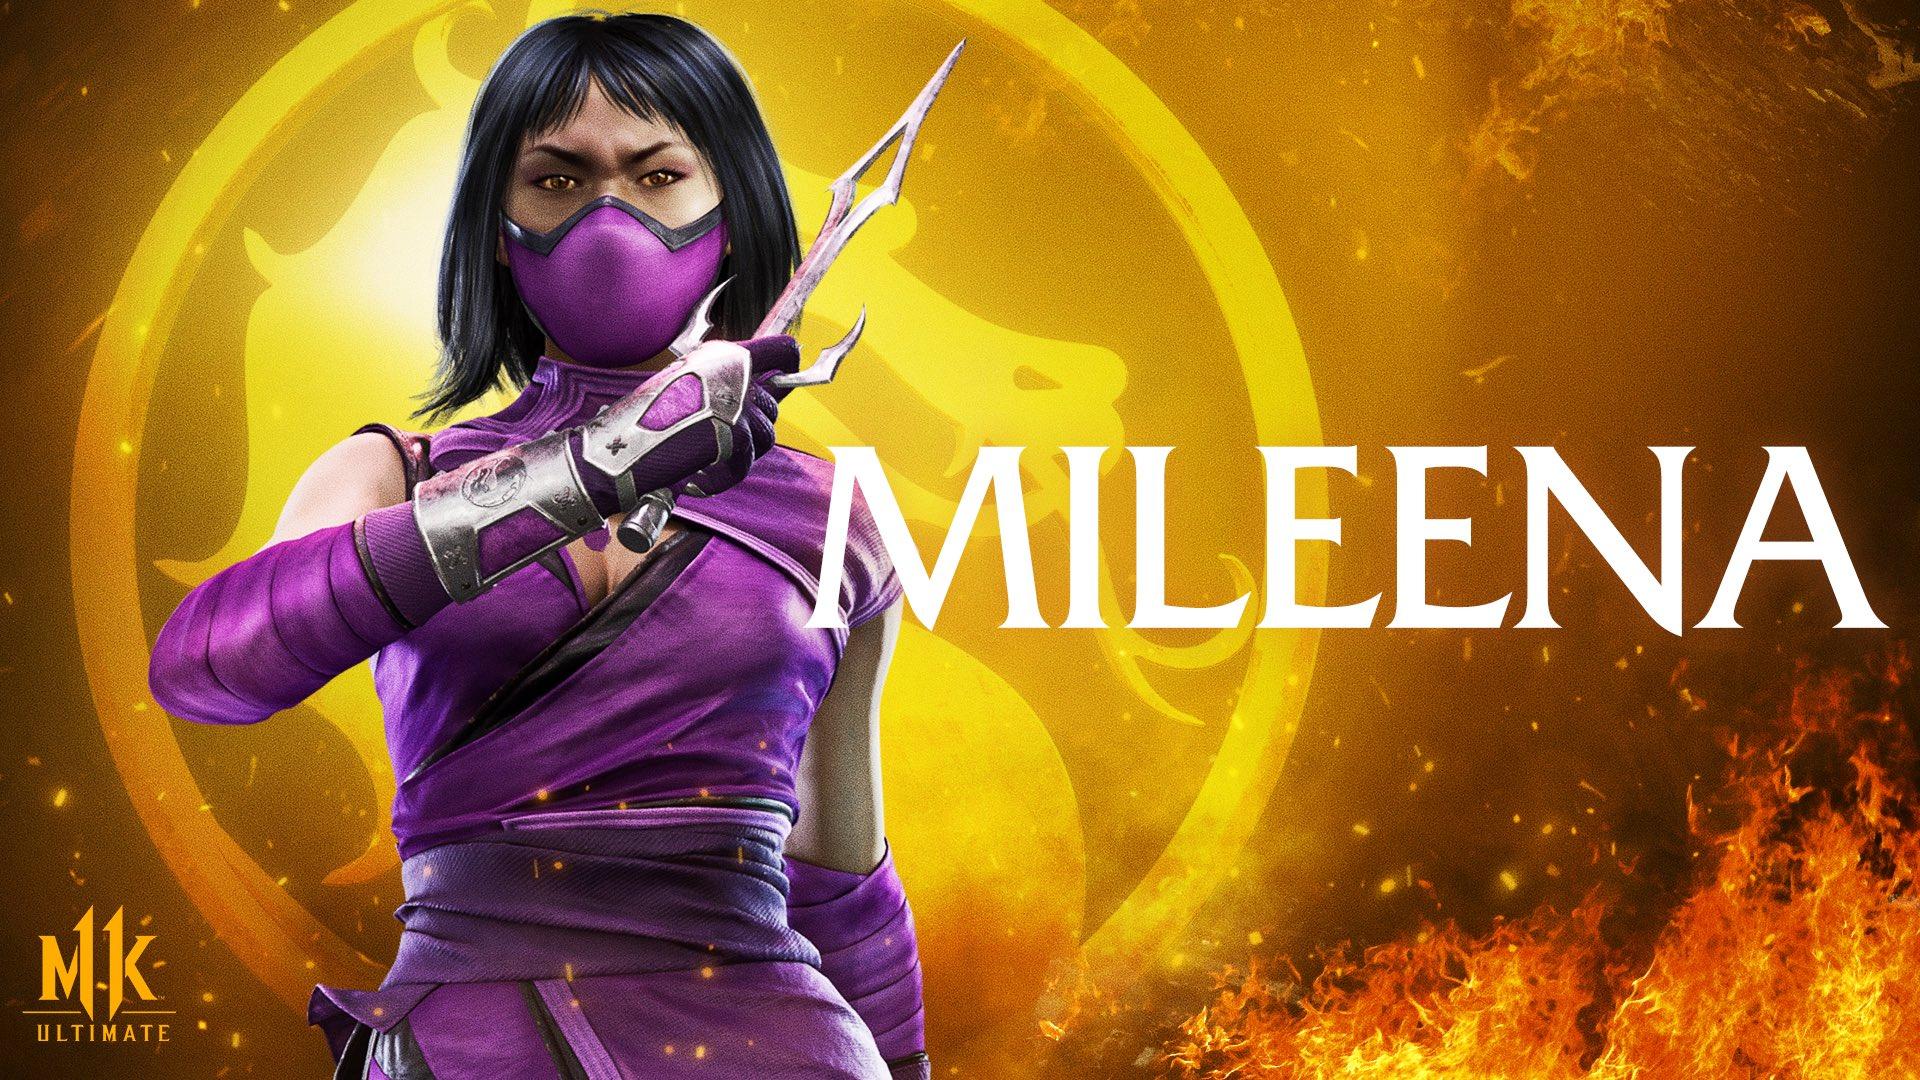 Mortal-Kombat-Mileena